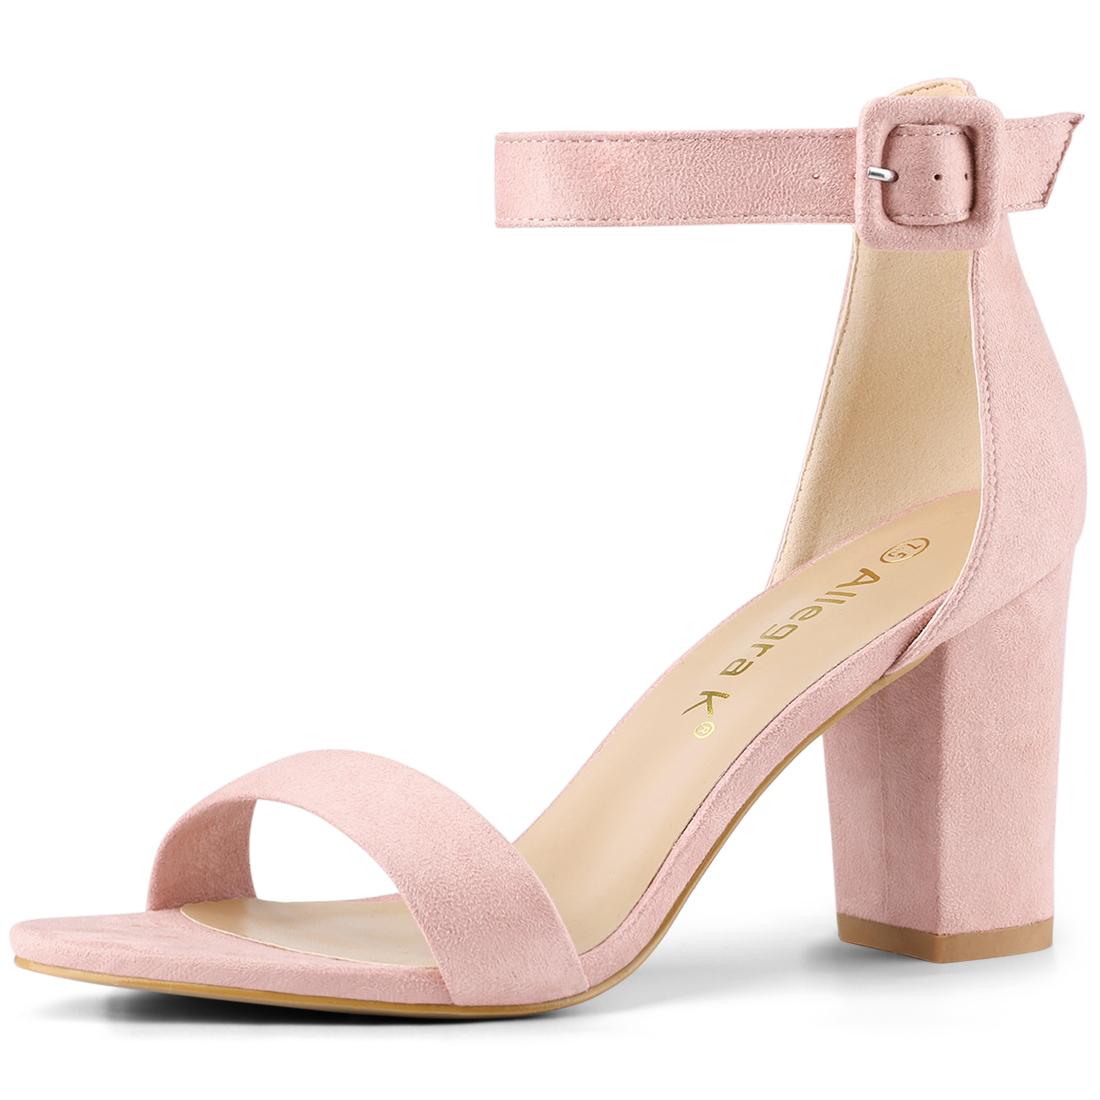 Allegra K Women's Chunky High Heel Ankle Strap Sandals Light Pink US 8.5